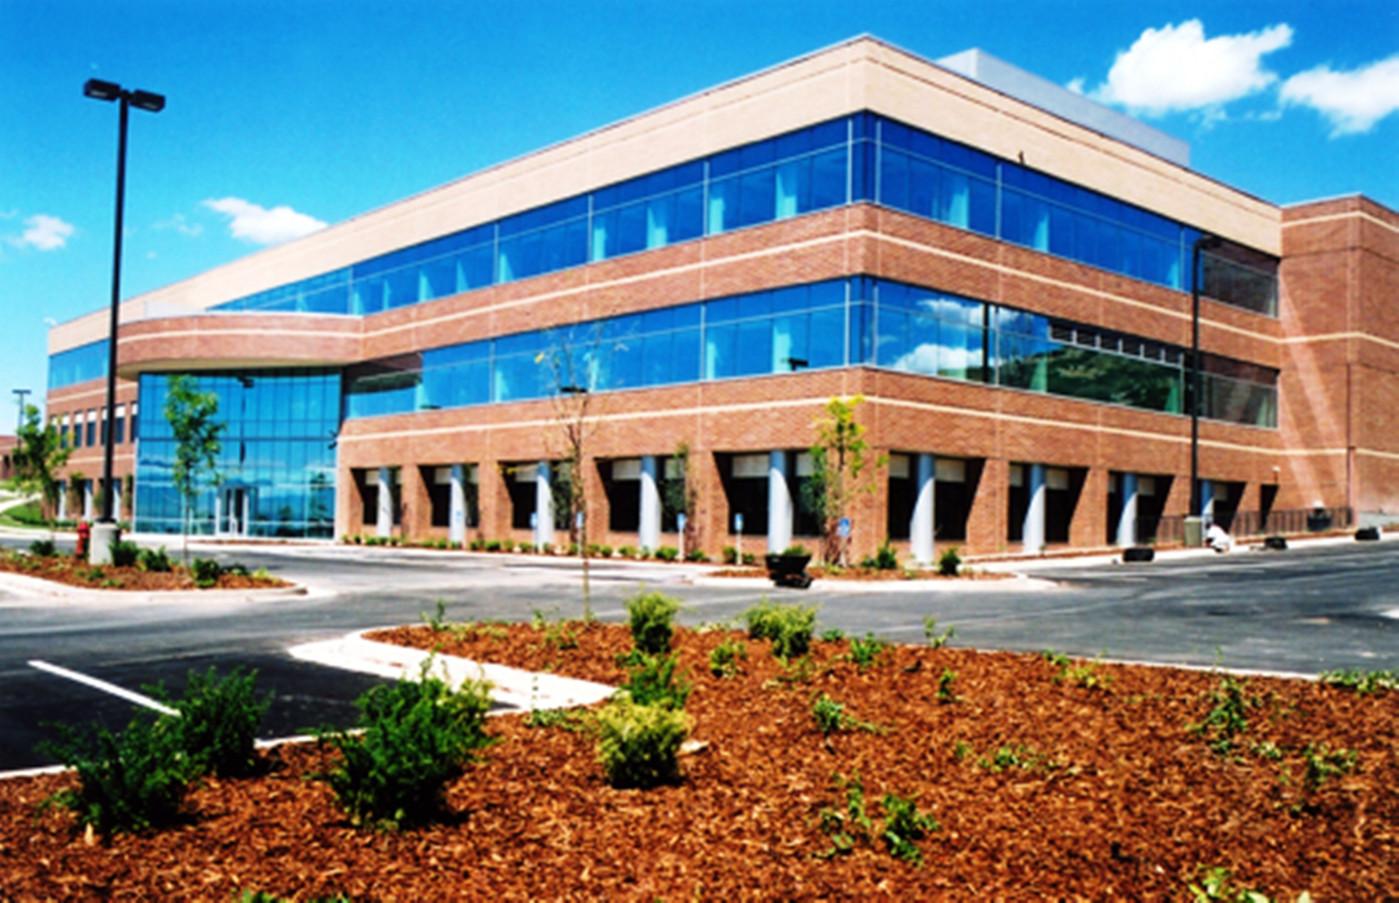 Watson Laboratories